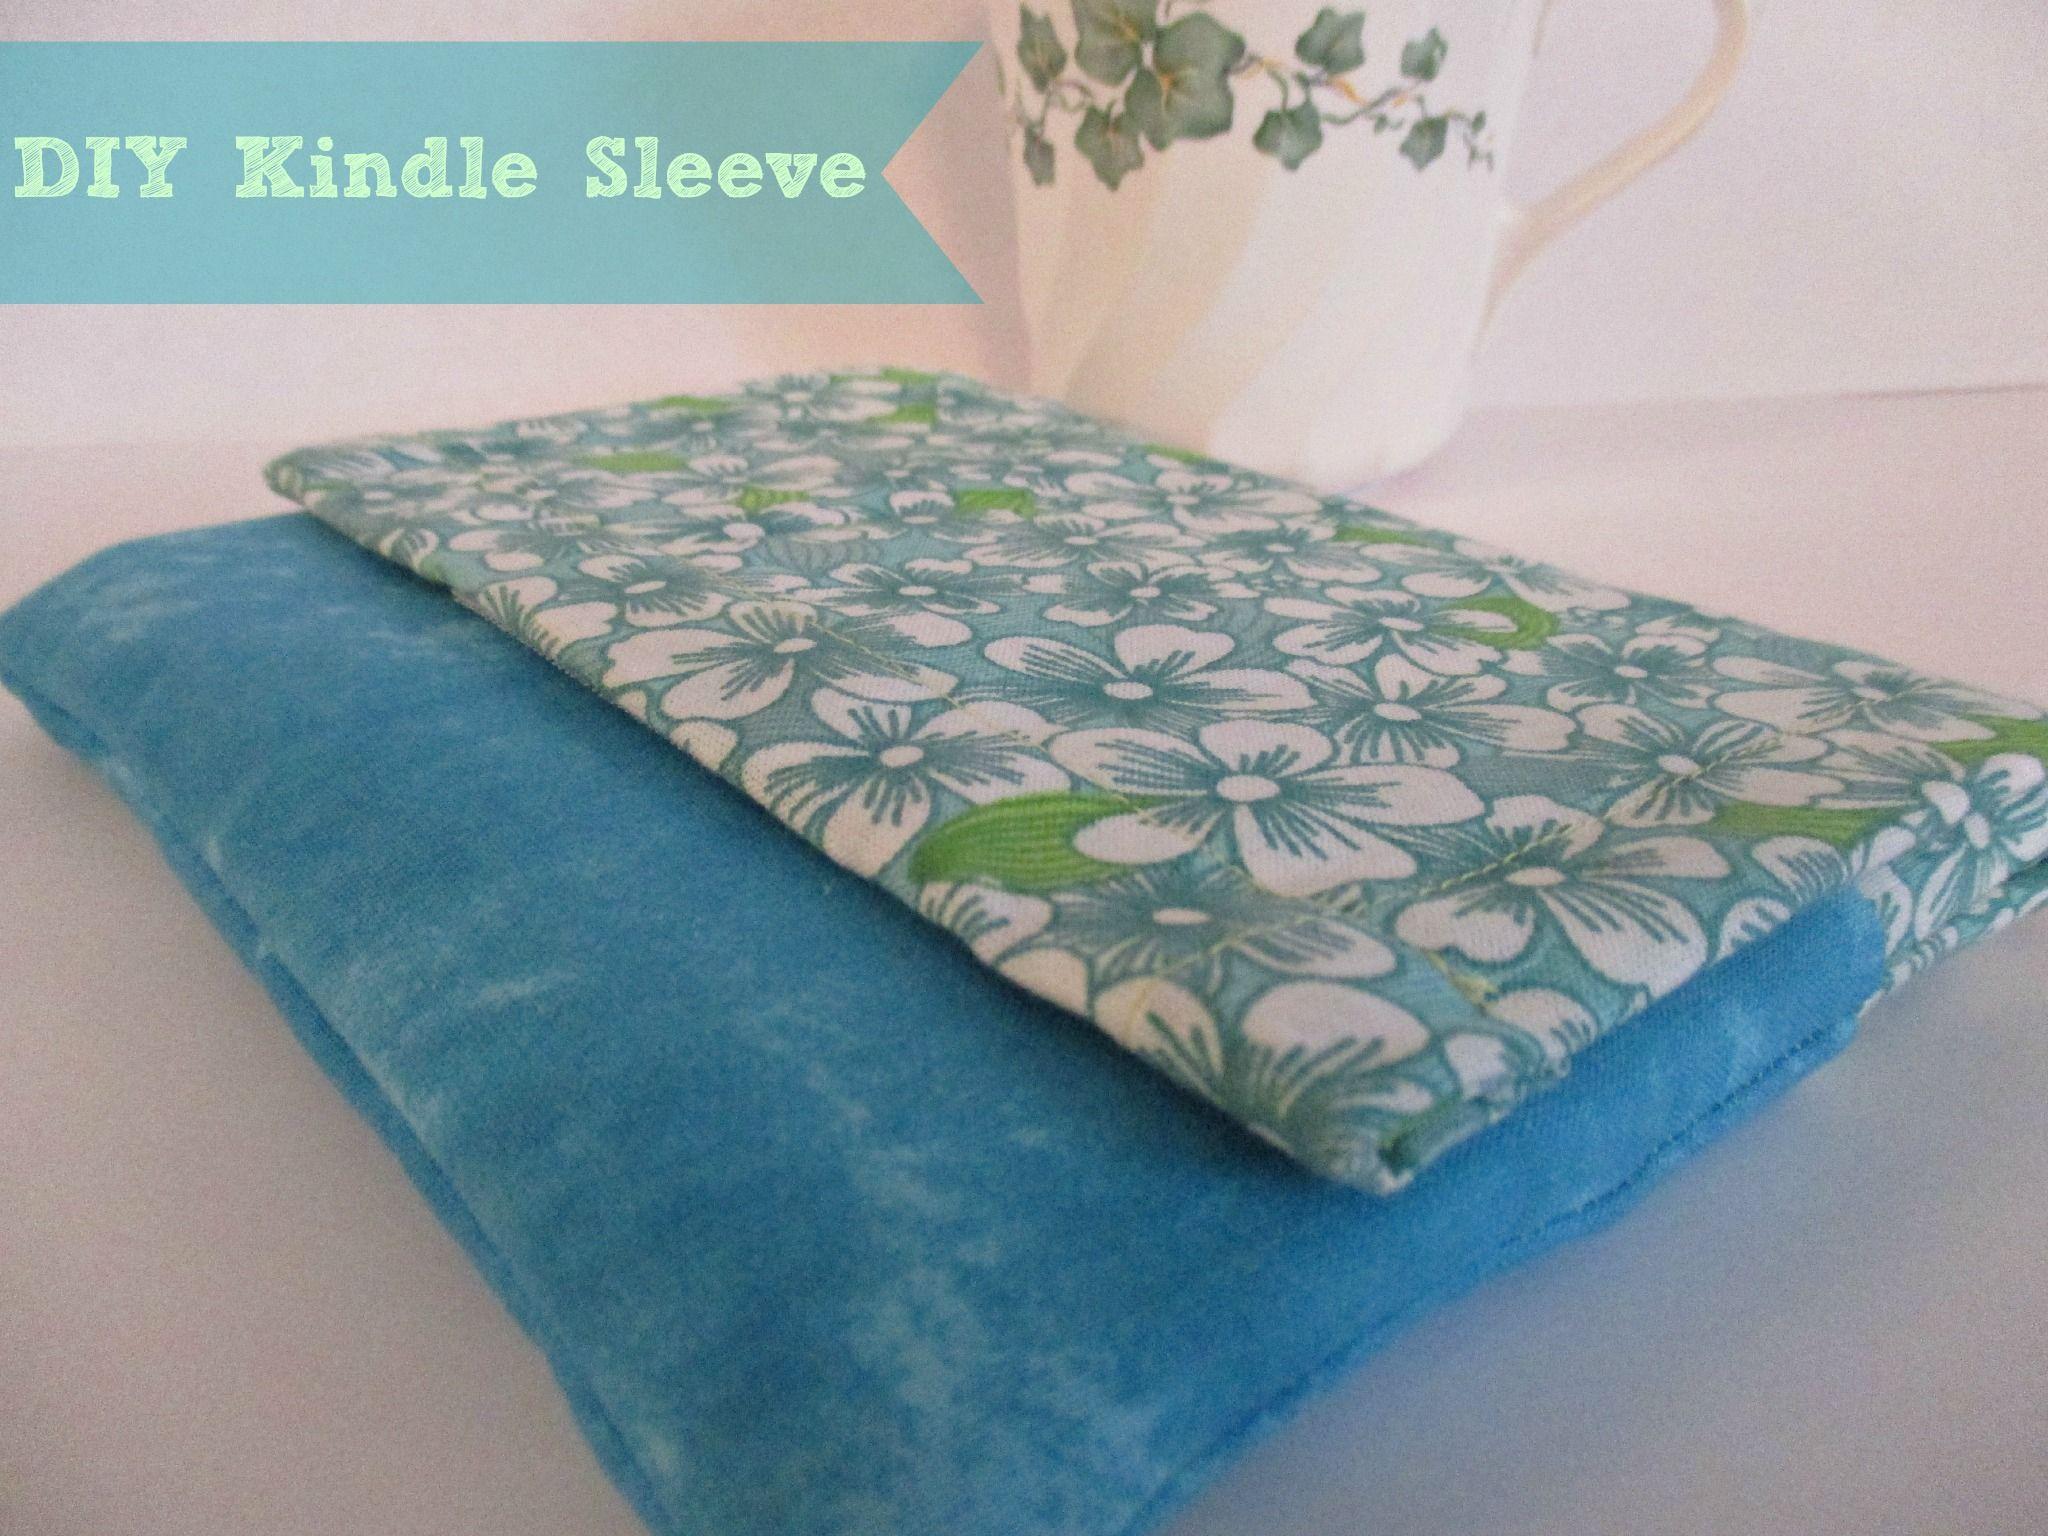 DIY Kindle Sleeve and Coffee | Kindle sleeve, Kindle, Free ...